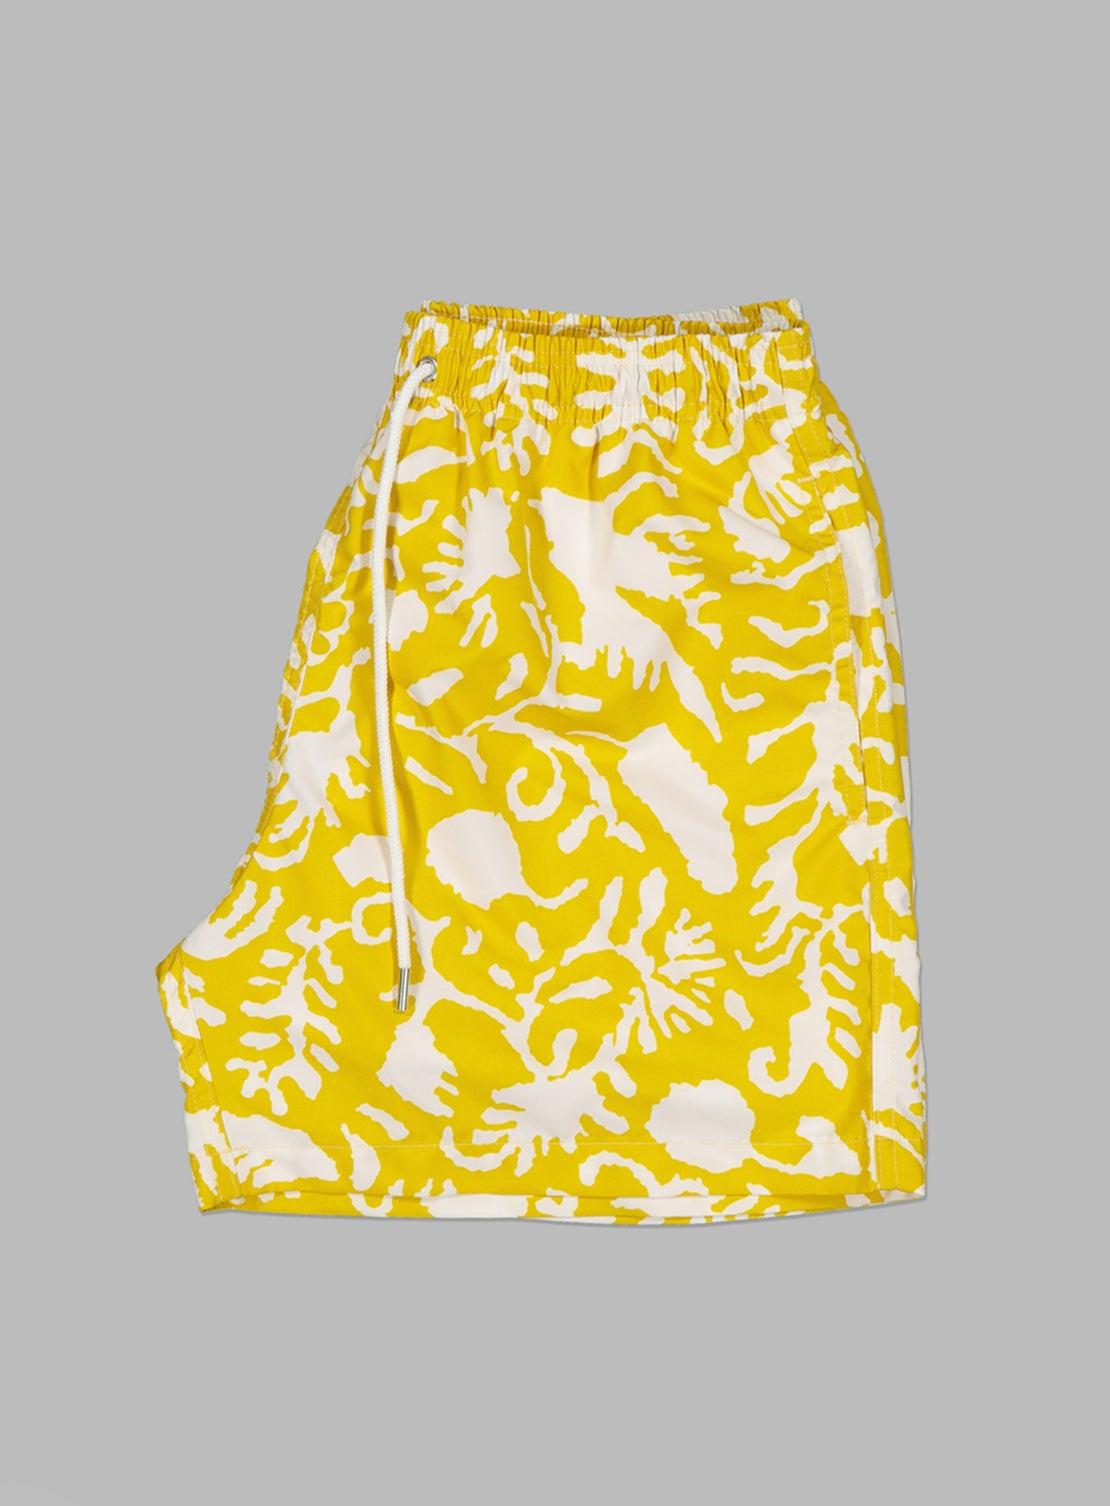 Yellow Floral Swim Trunks